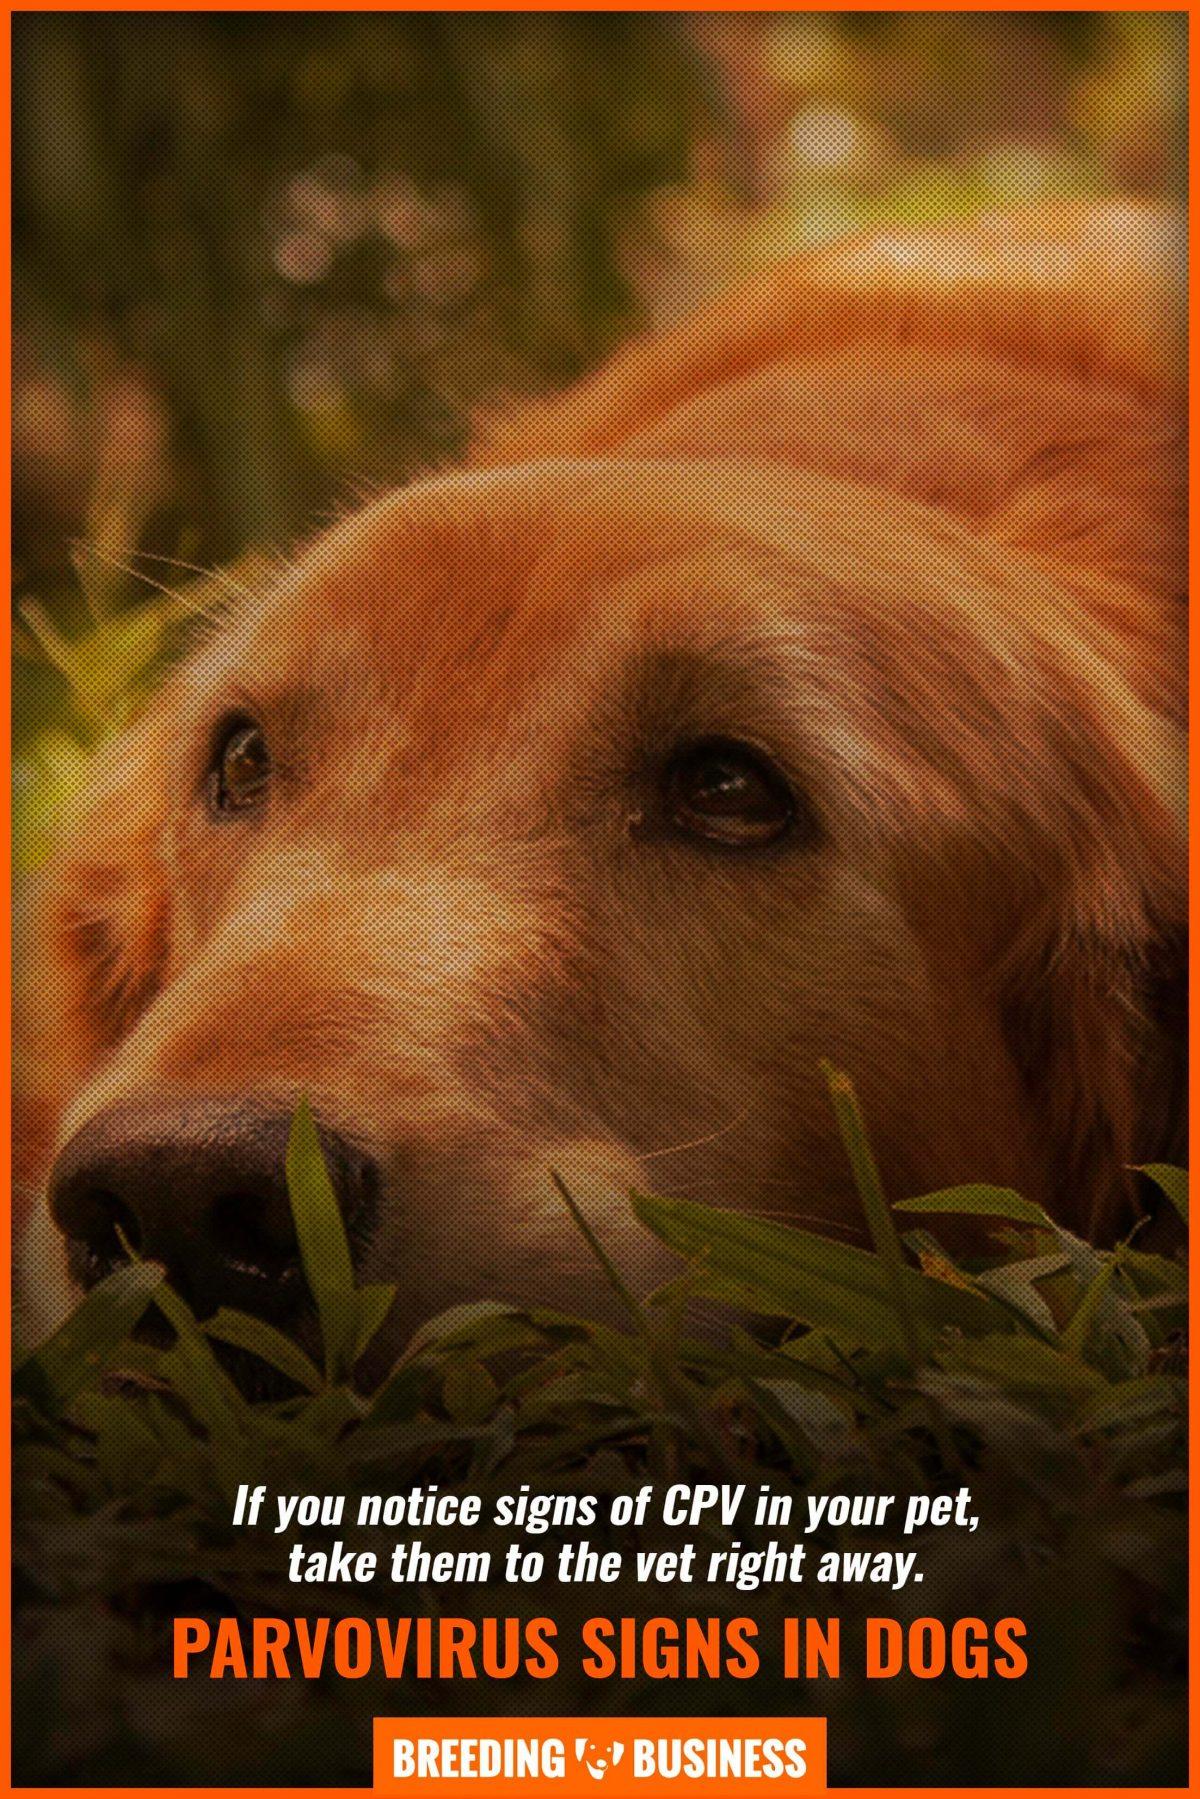 parvovirus signs in dogs